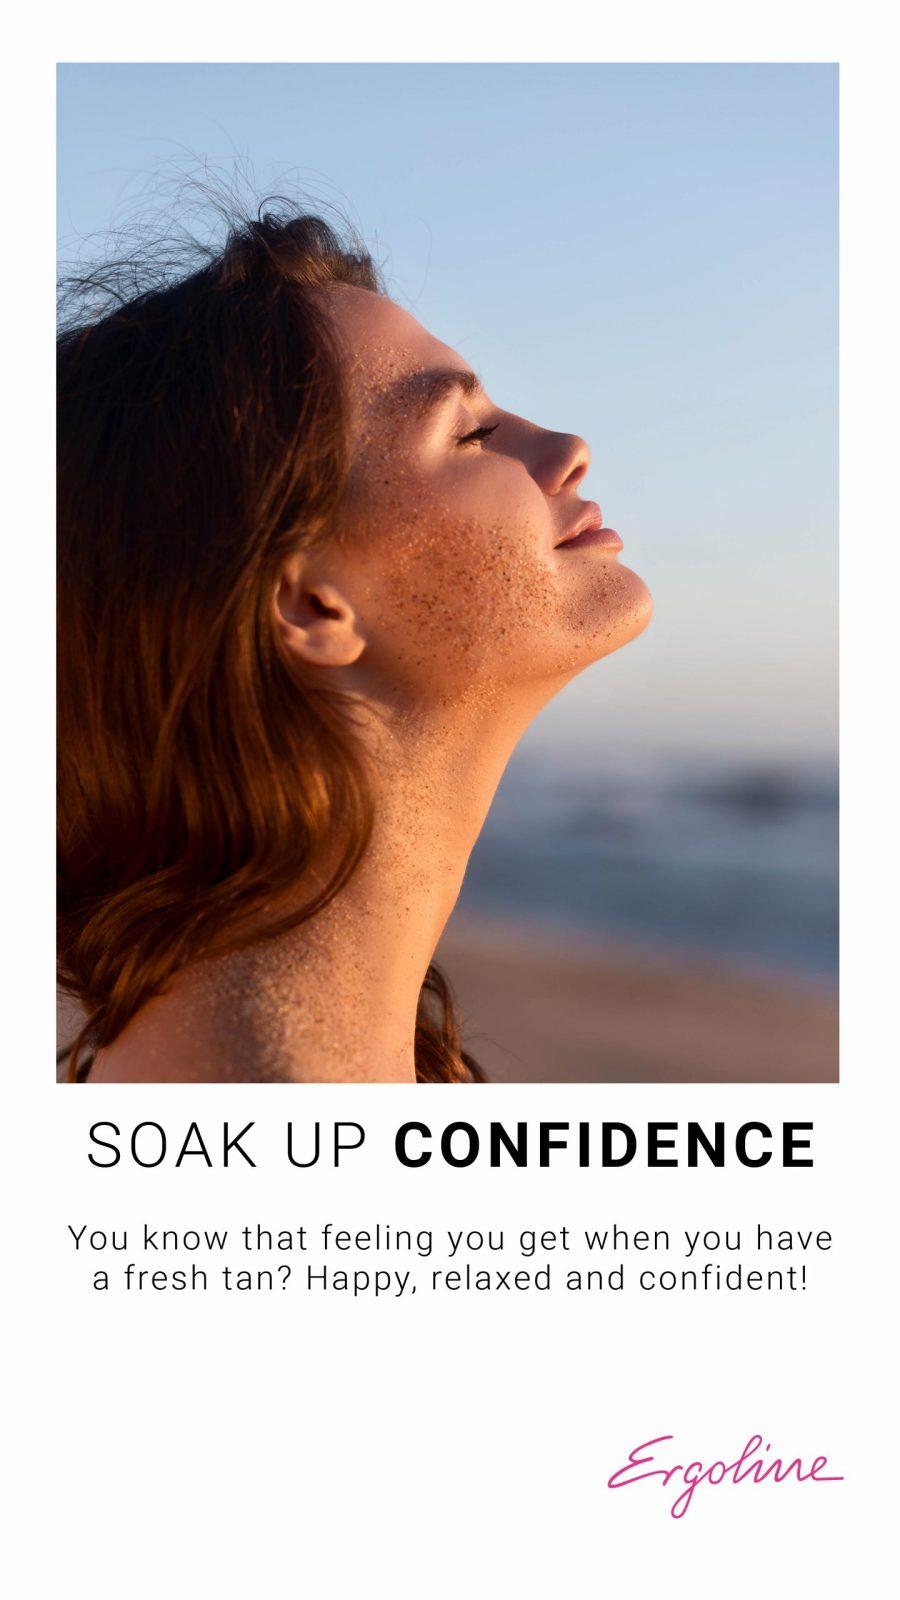 Soak Up Confidence